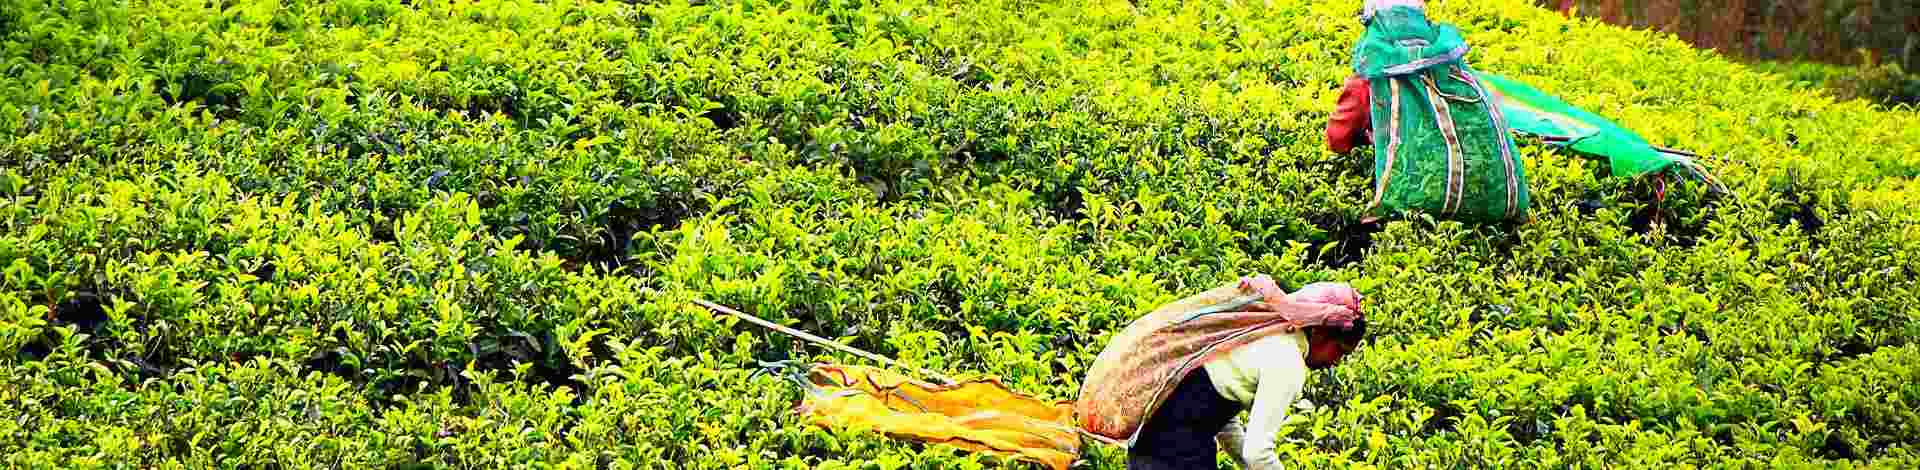 Plantations thé Sri Lanka cueilleuses - Asie Online